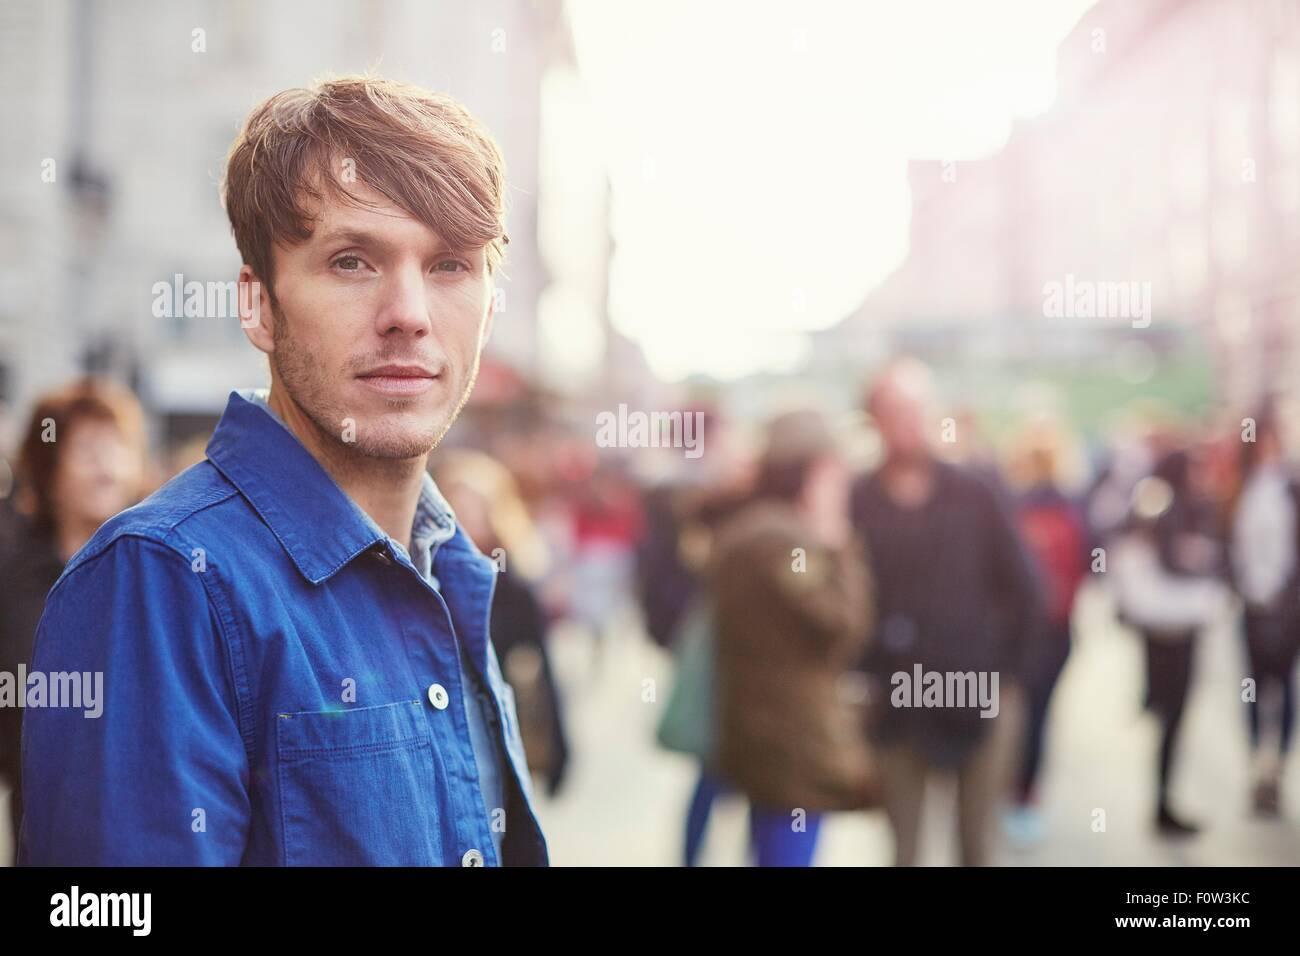 Portrait of mid adult man on crowded street, London, UK - Stock Image